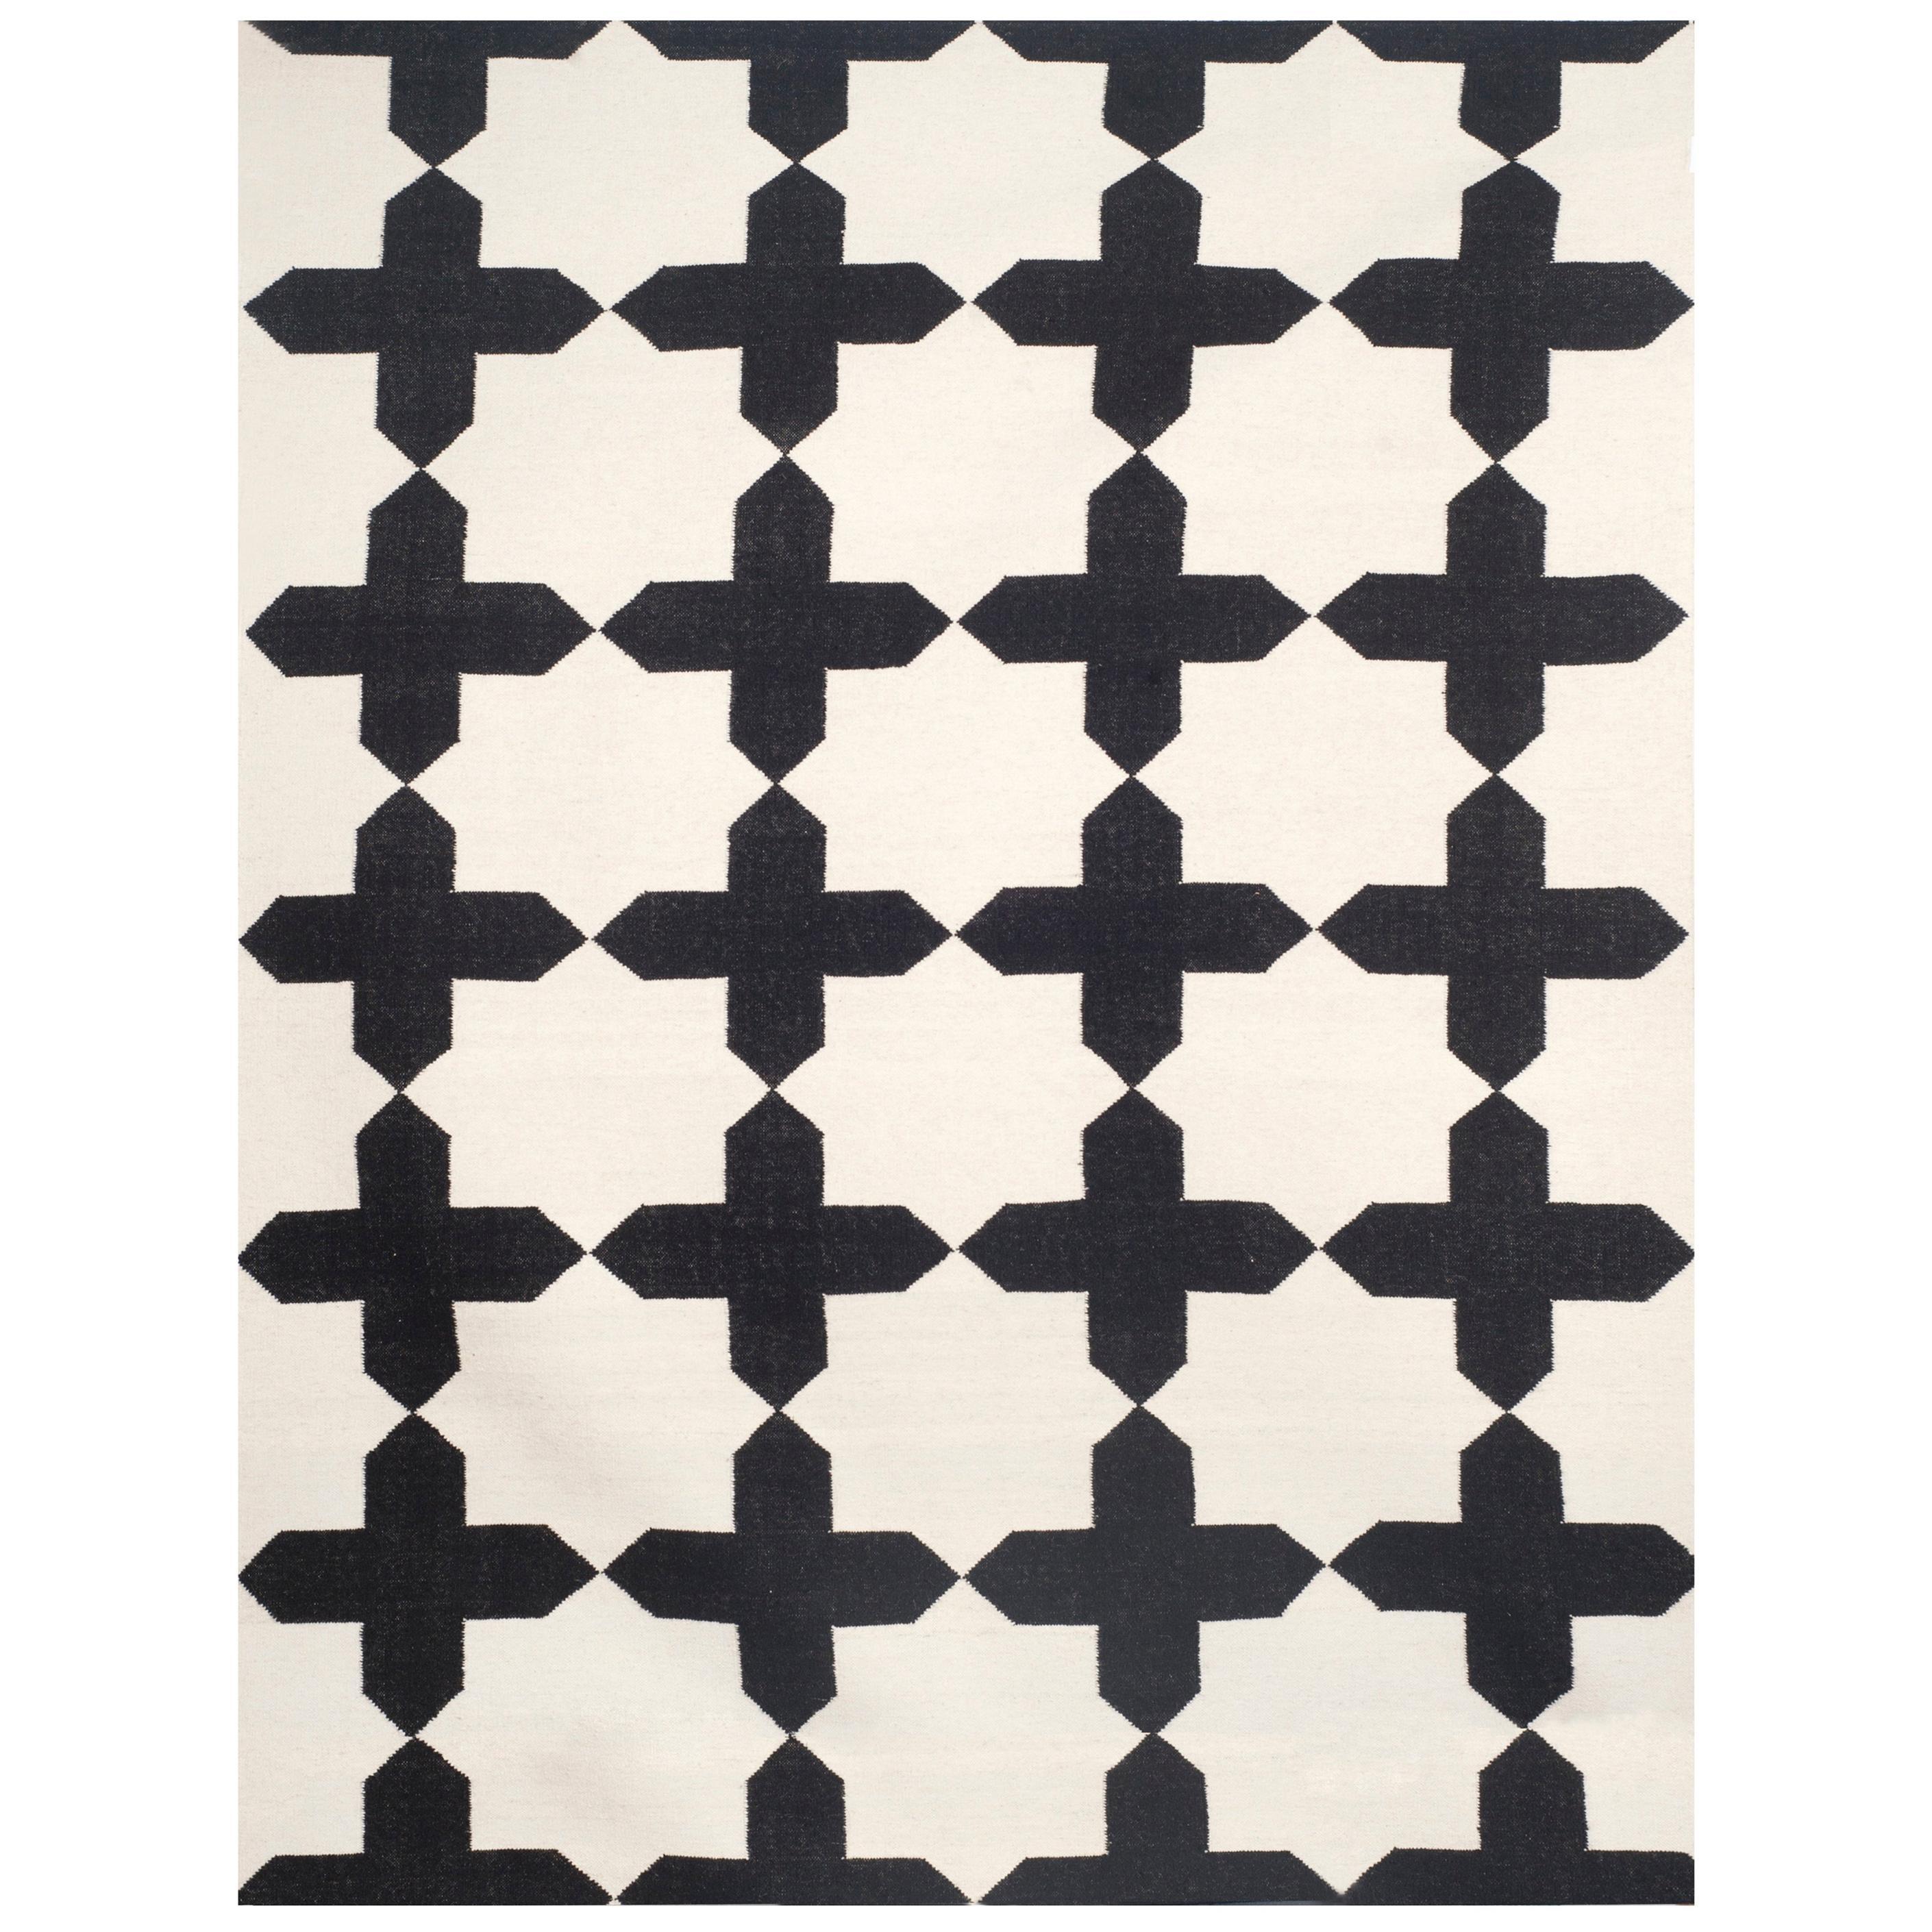 Kilombo Home 21st Century Handwoven Flat-Weave Wool Kilim Black and White